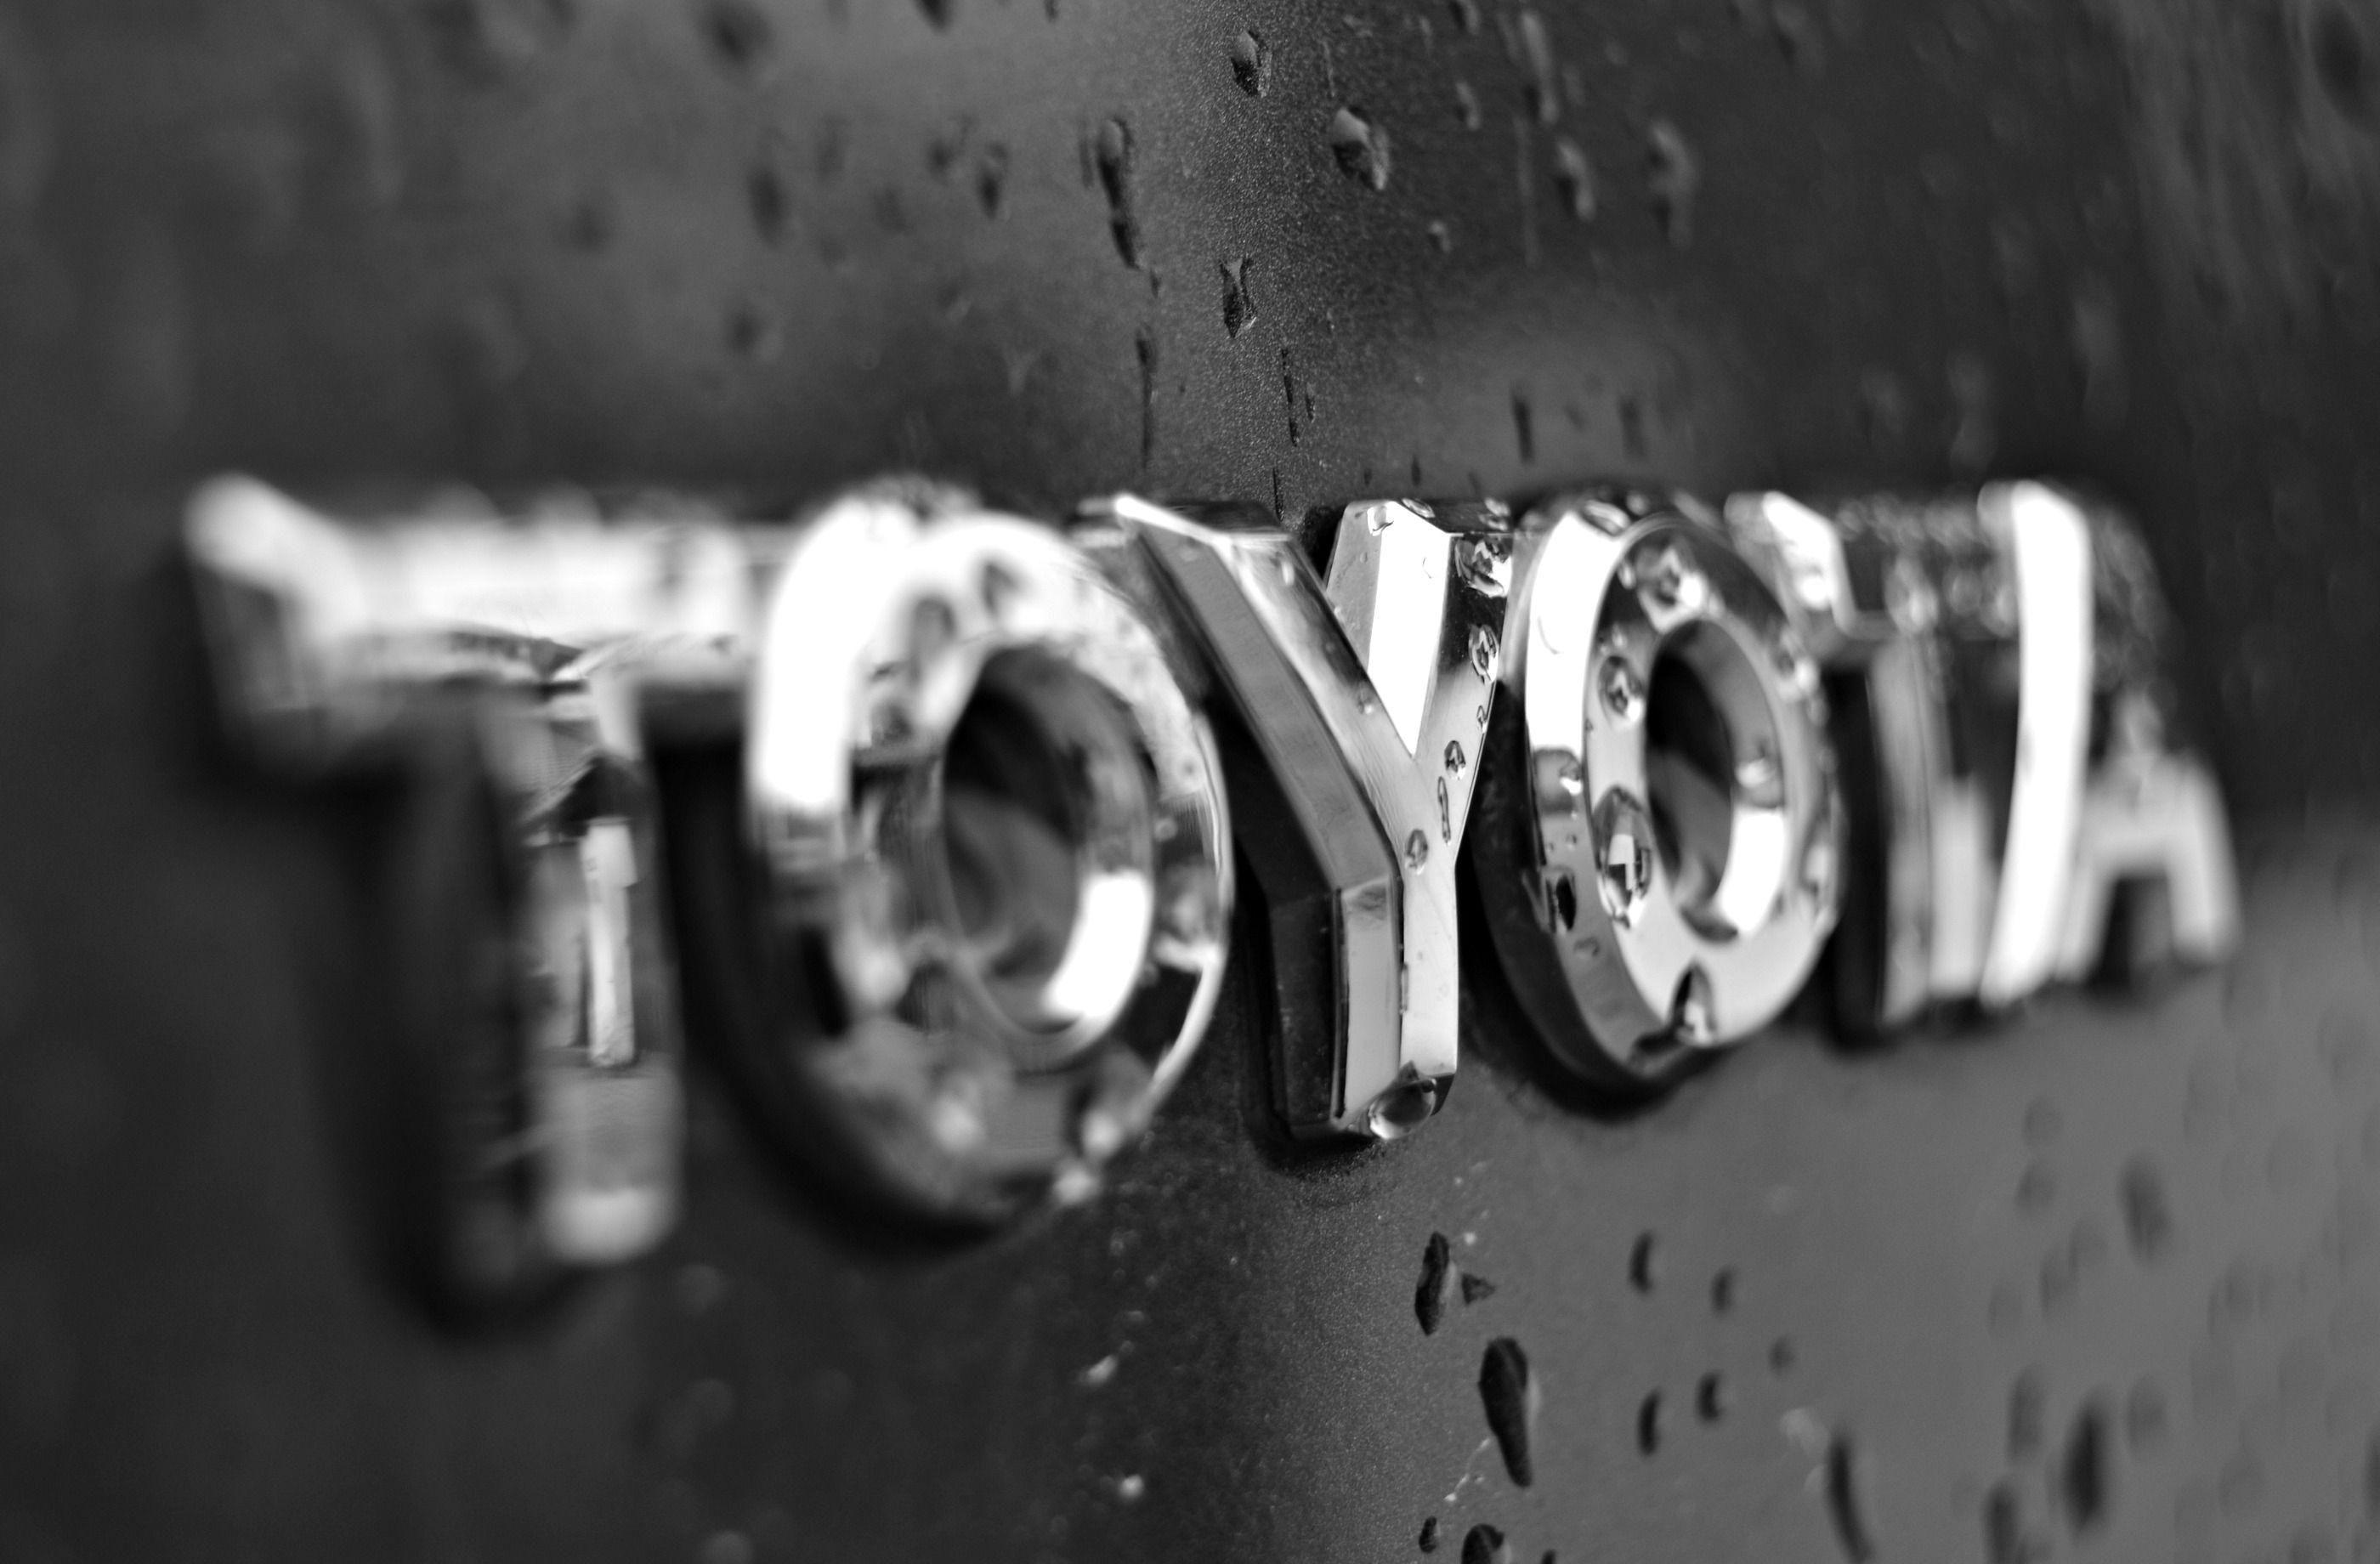 toyota logo full hd wallpapers free download  14        urdunewtrend com  hd